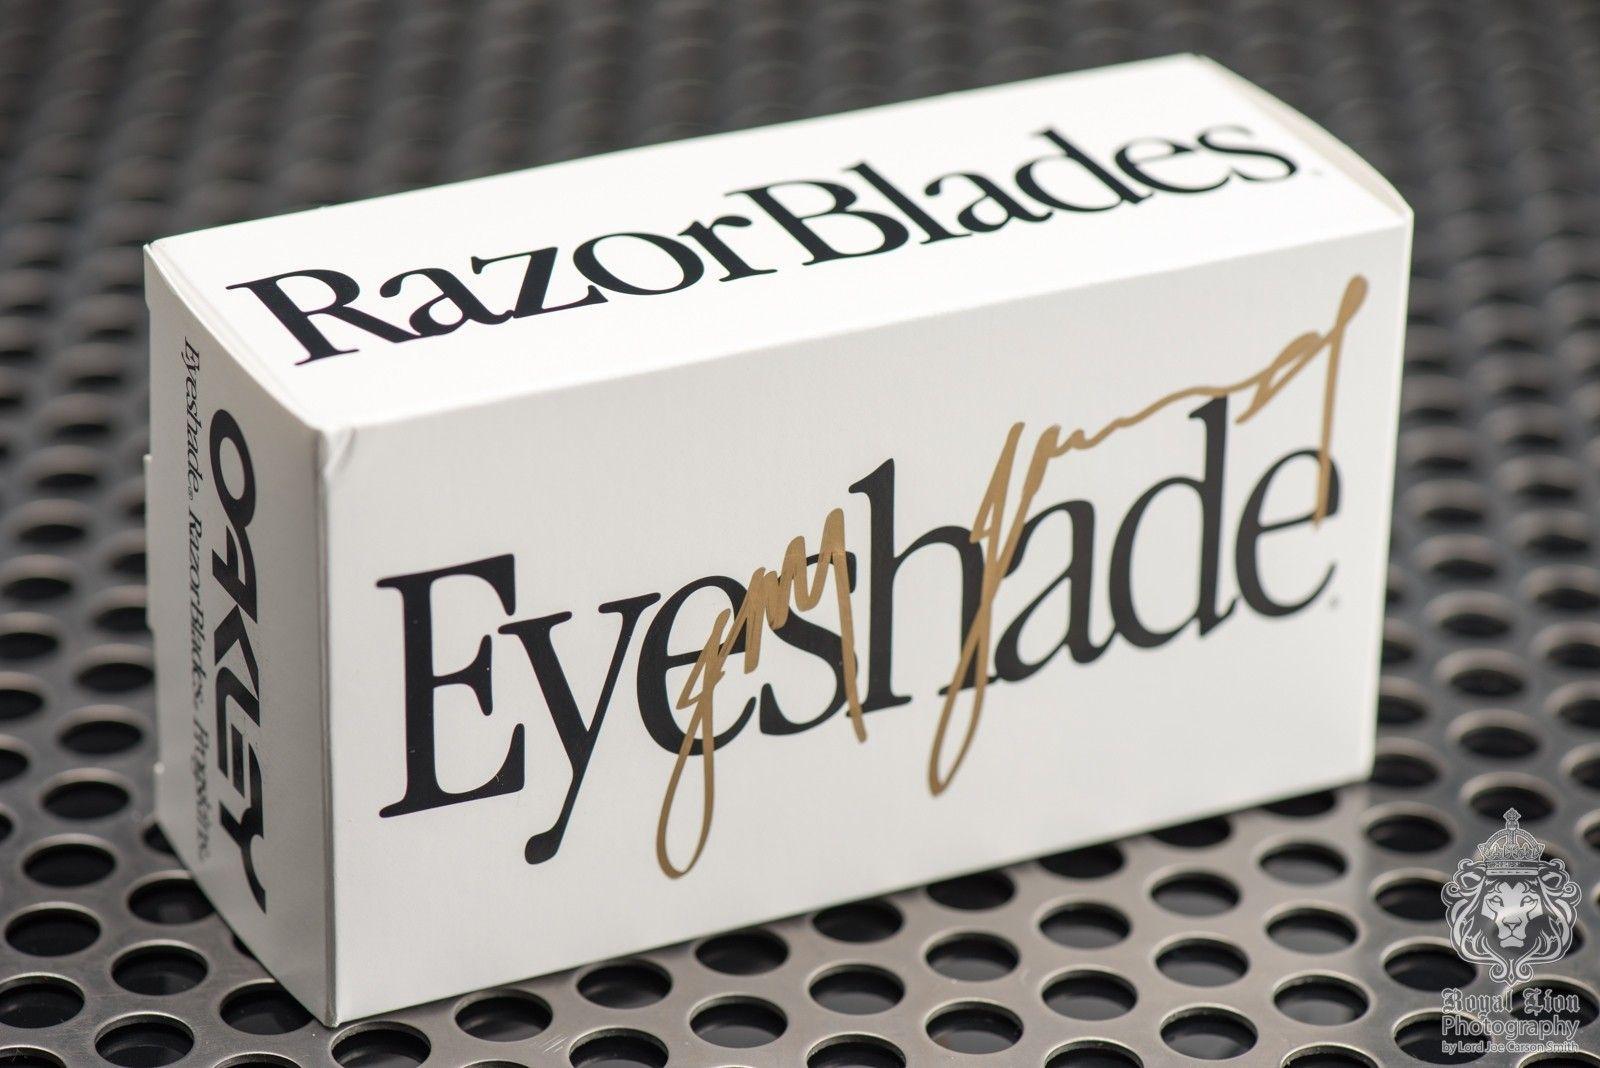 1 of 3 Signed Oakley Heritage Eyeshades by Jim Jannard - Seafoam with Grey Mint in Box - ND8_3472.jpg